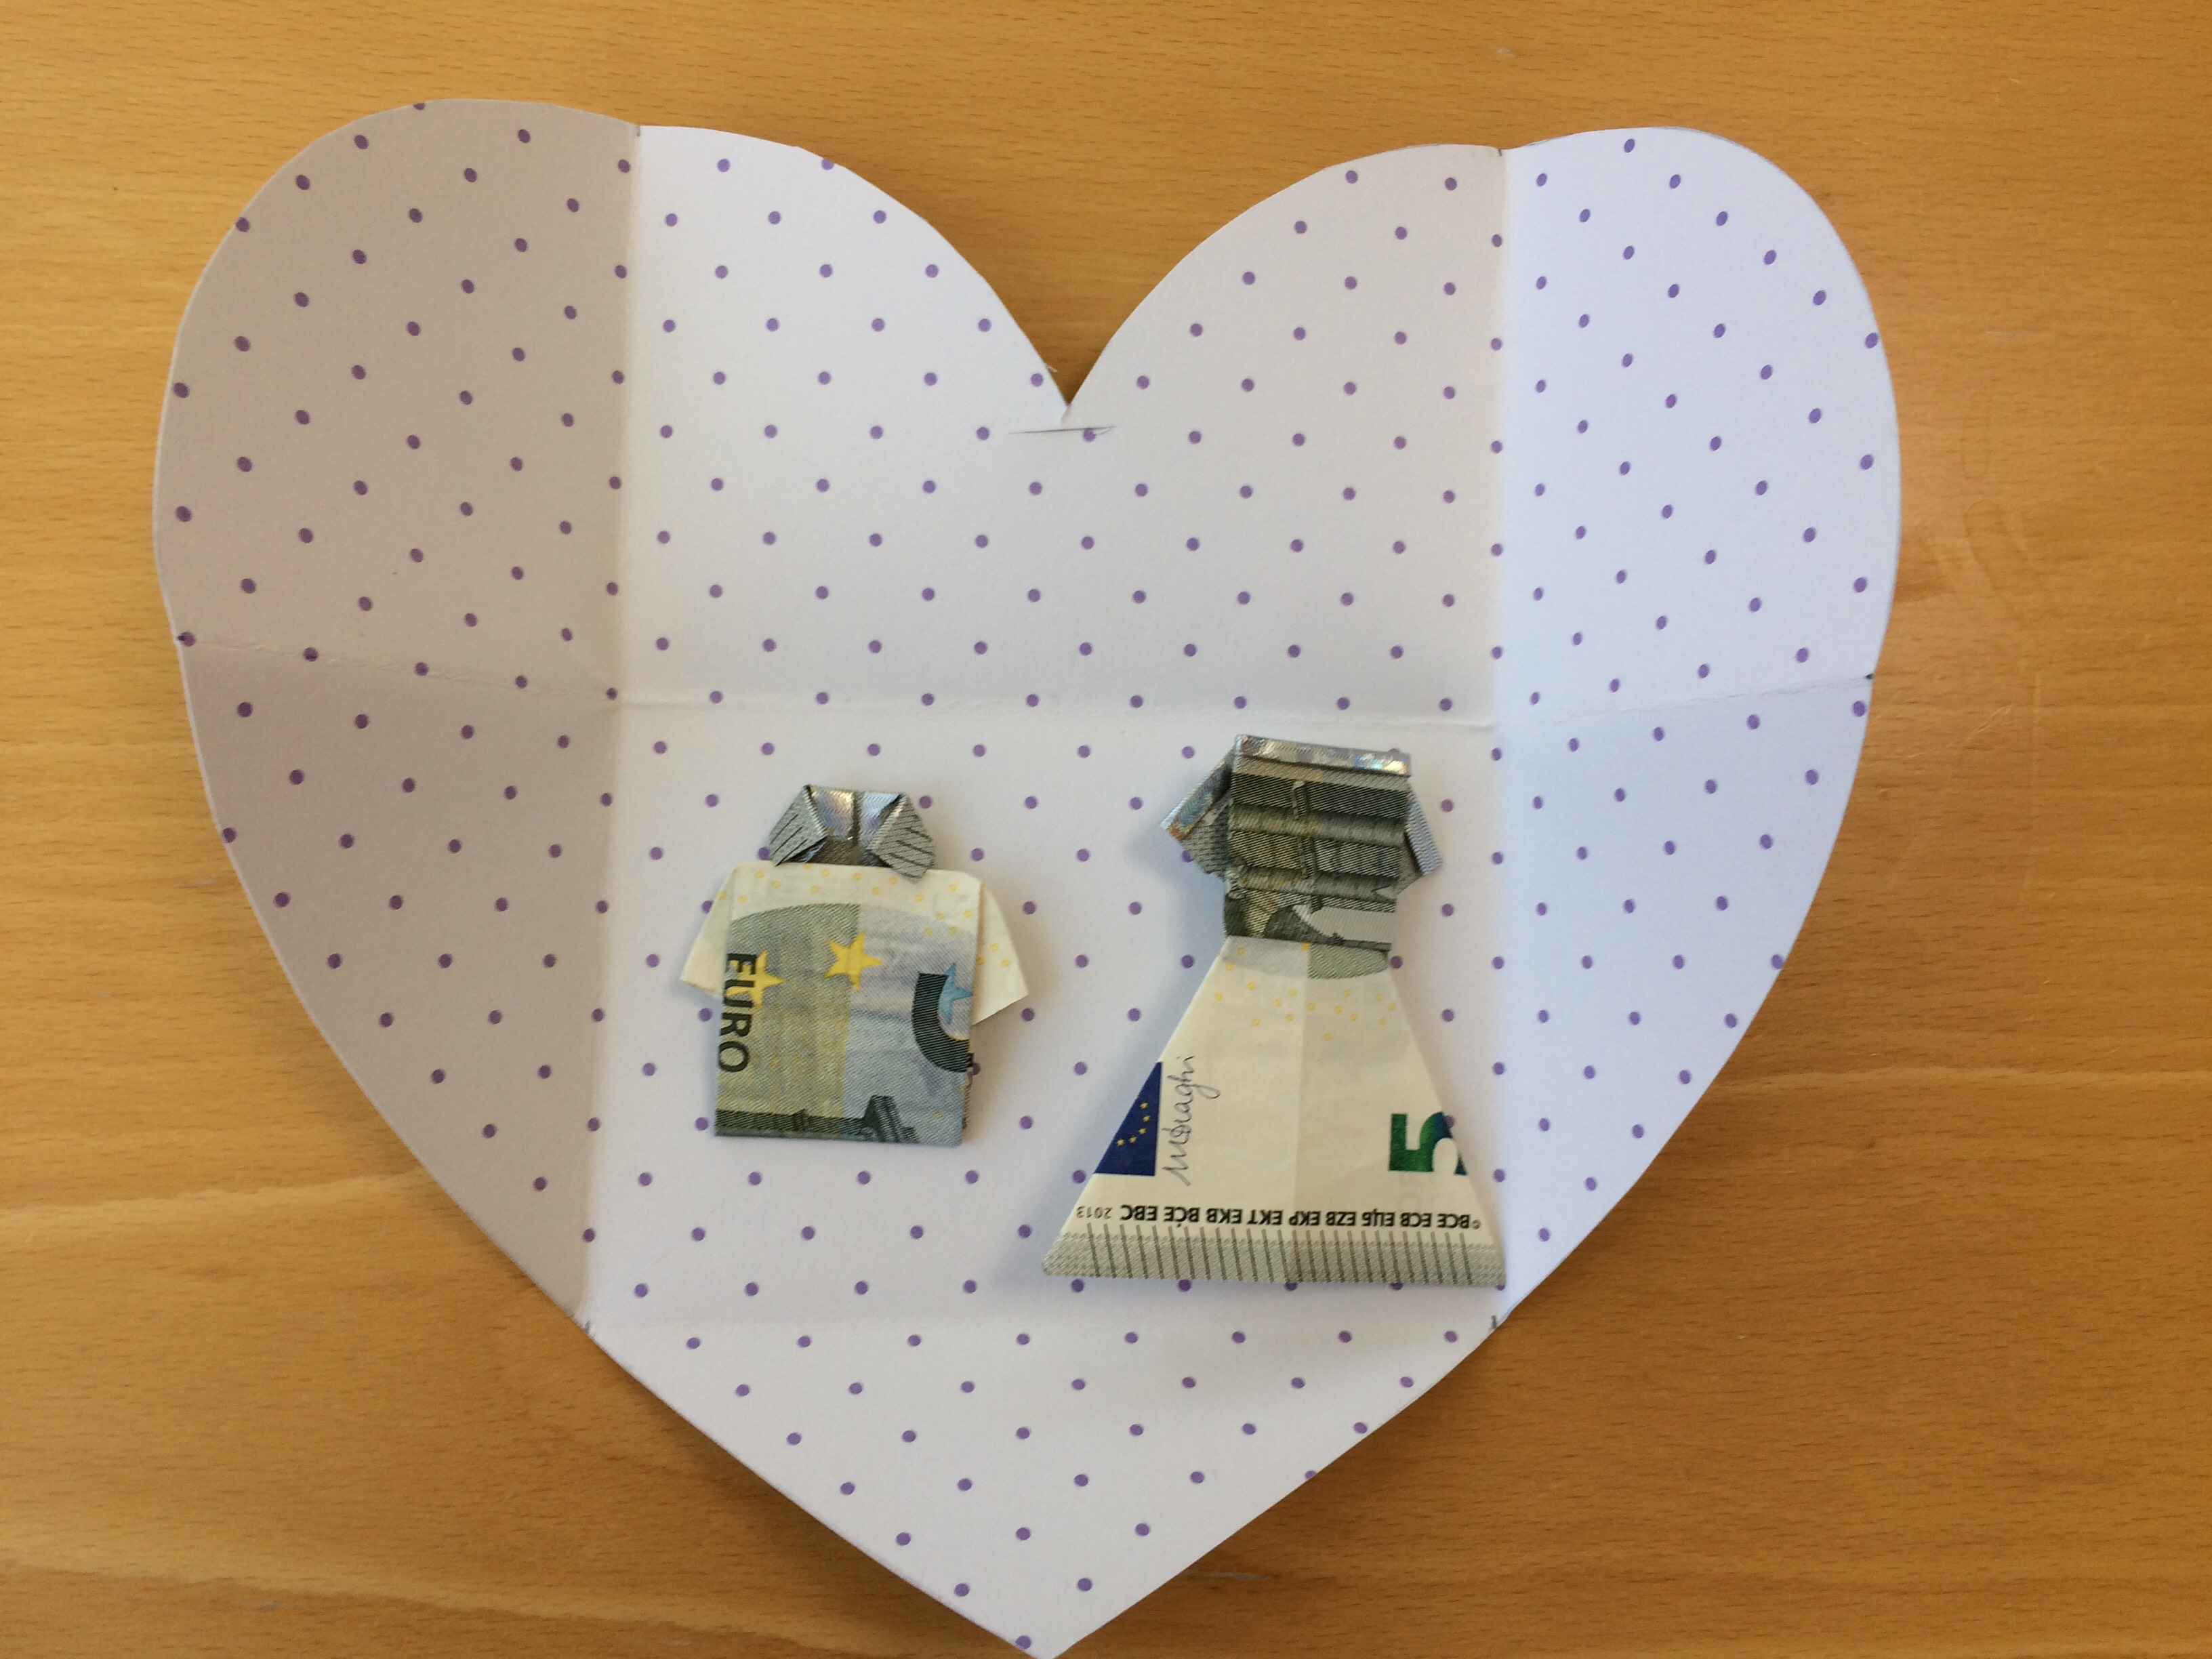 Origineel Geld Cadeau Geven Diy Hartvormige Enveloppe